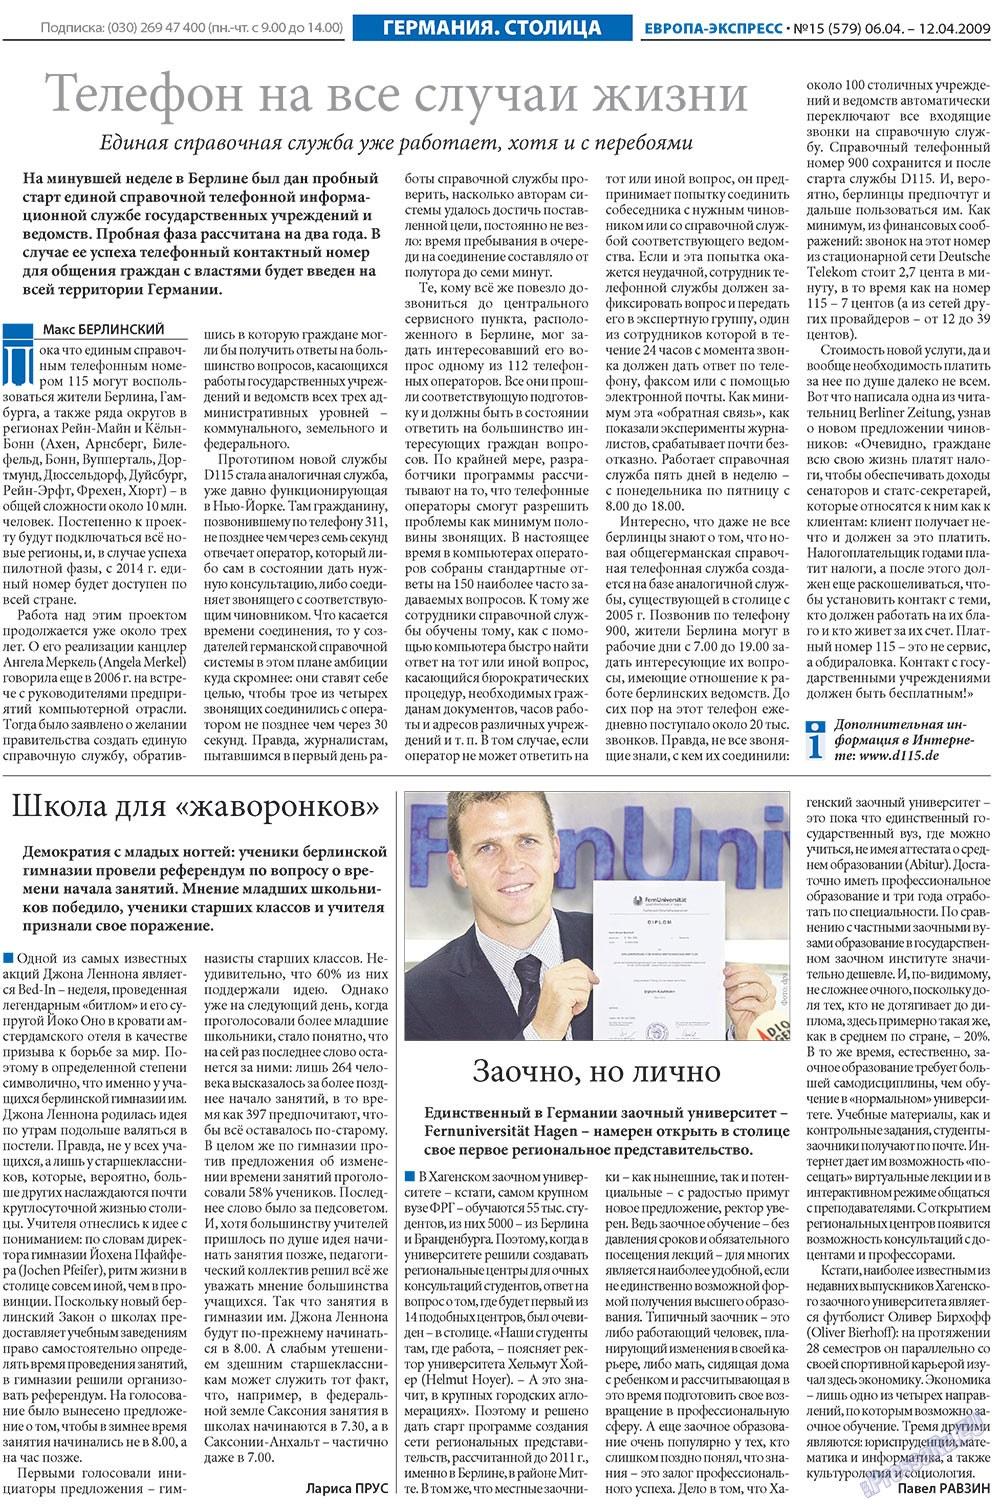 Европа экспресс (газета). 2009 год, номер 15, стр. 6